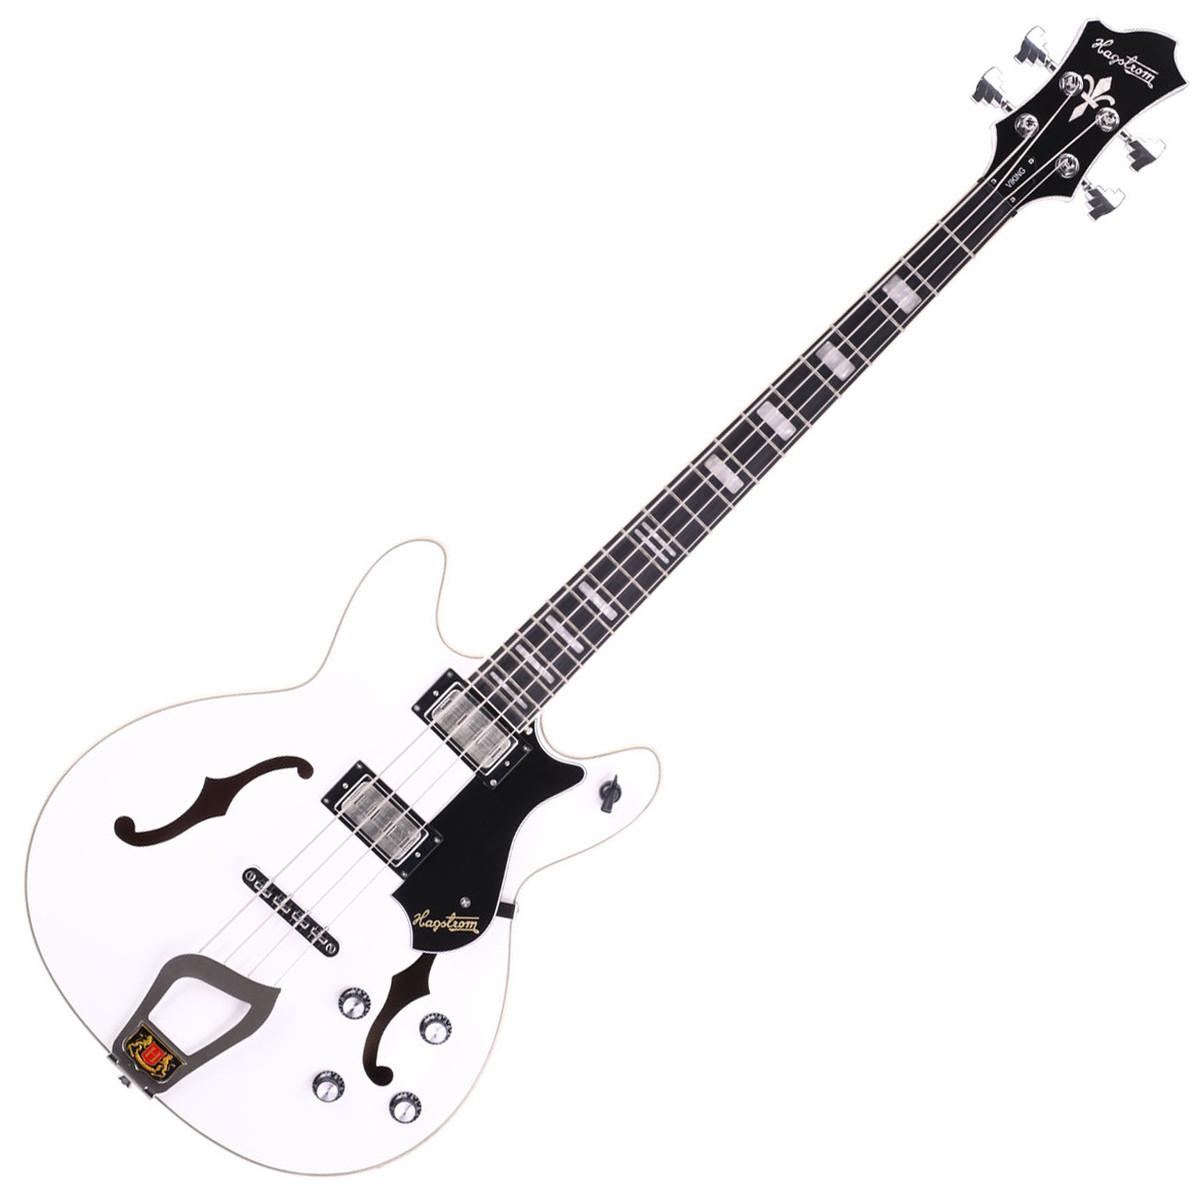 hagstrom viking bass short scale guitar  white at gear4music